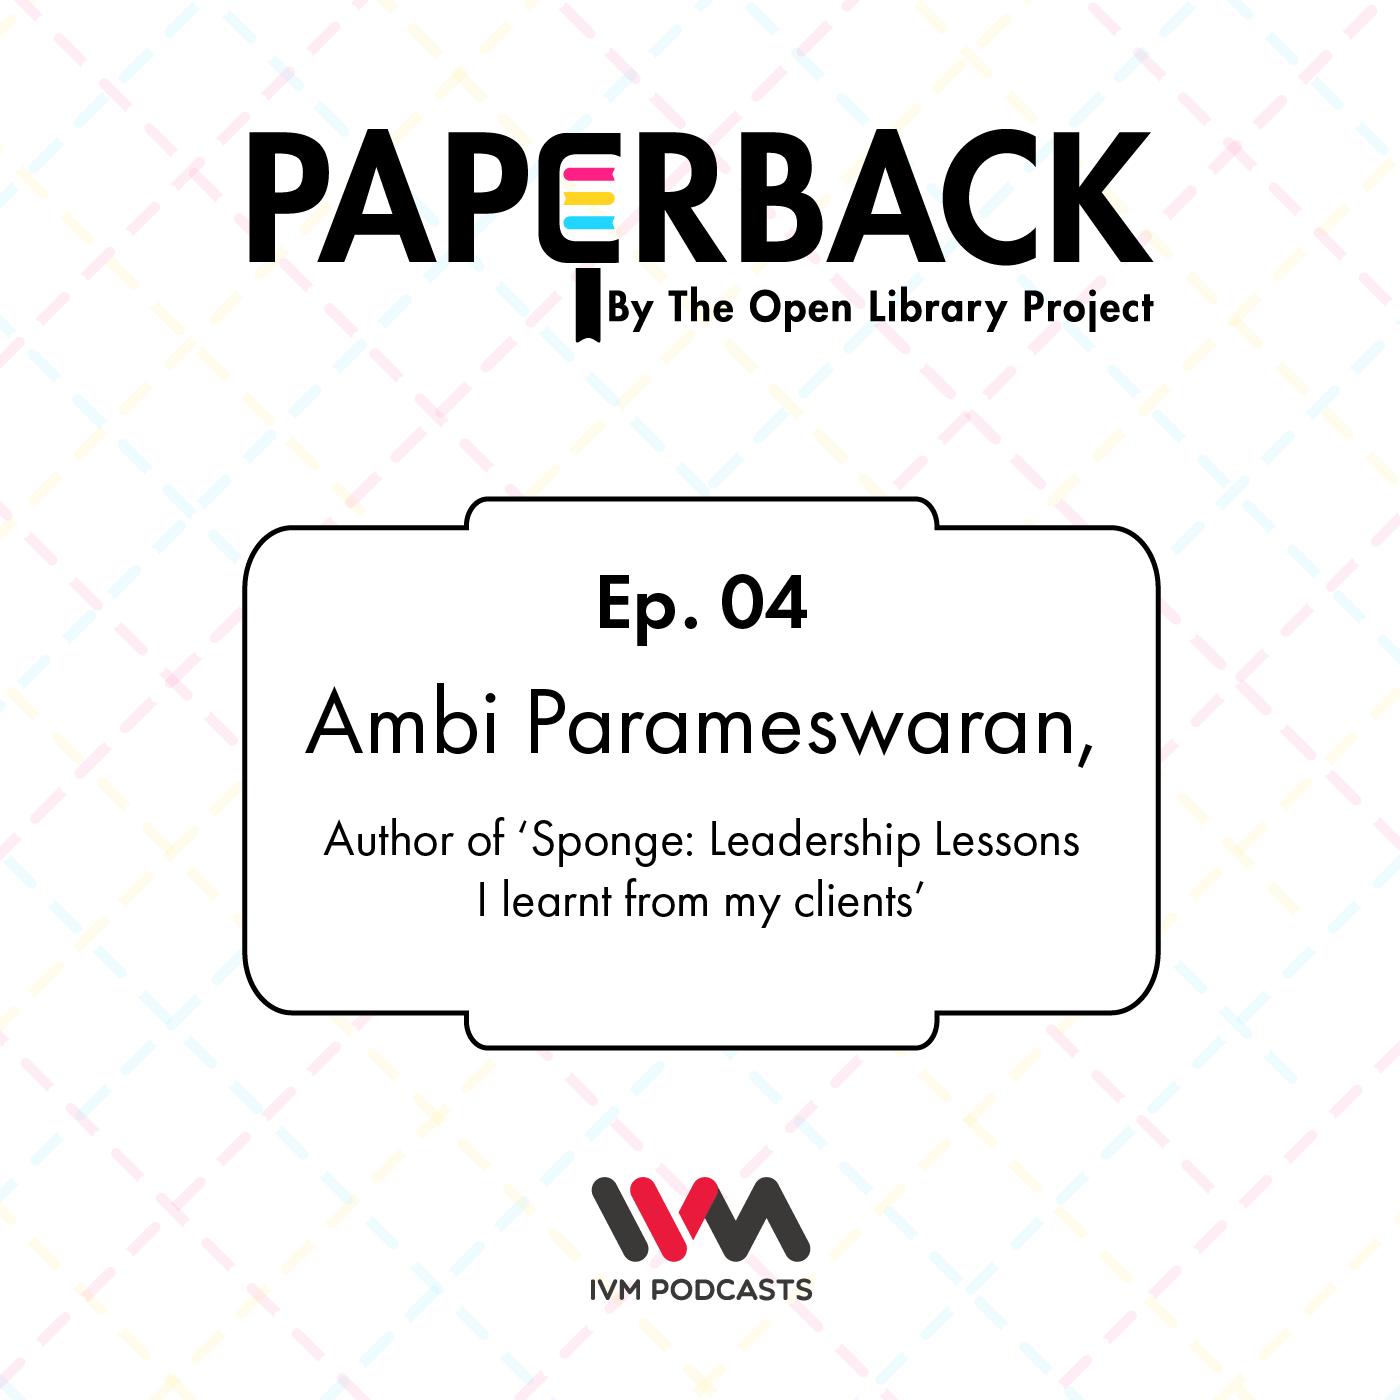 Ep. 04: Ambi Parameswaran